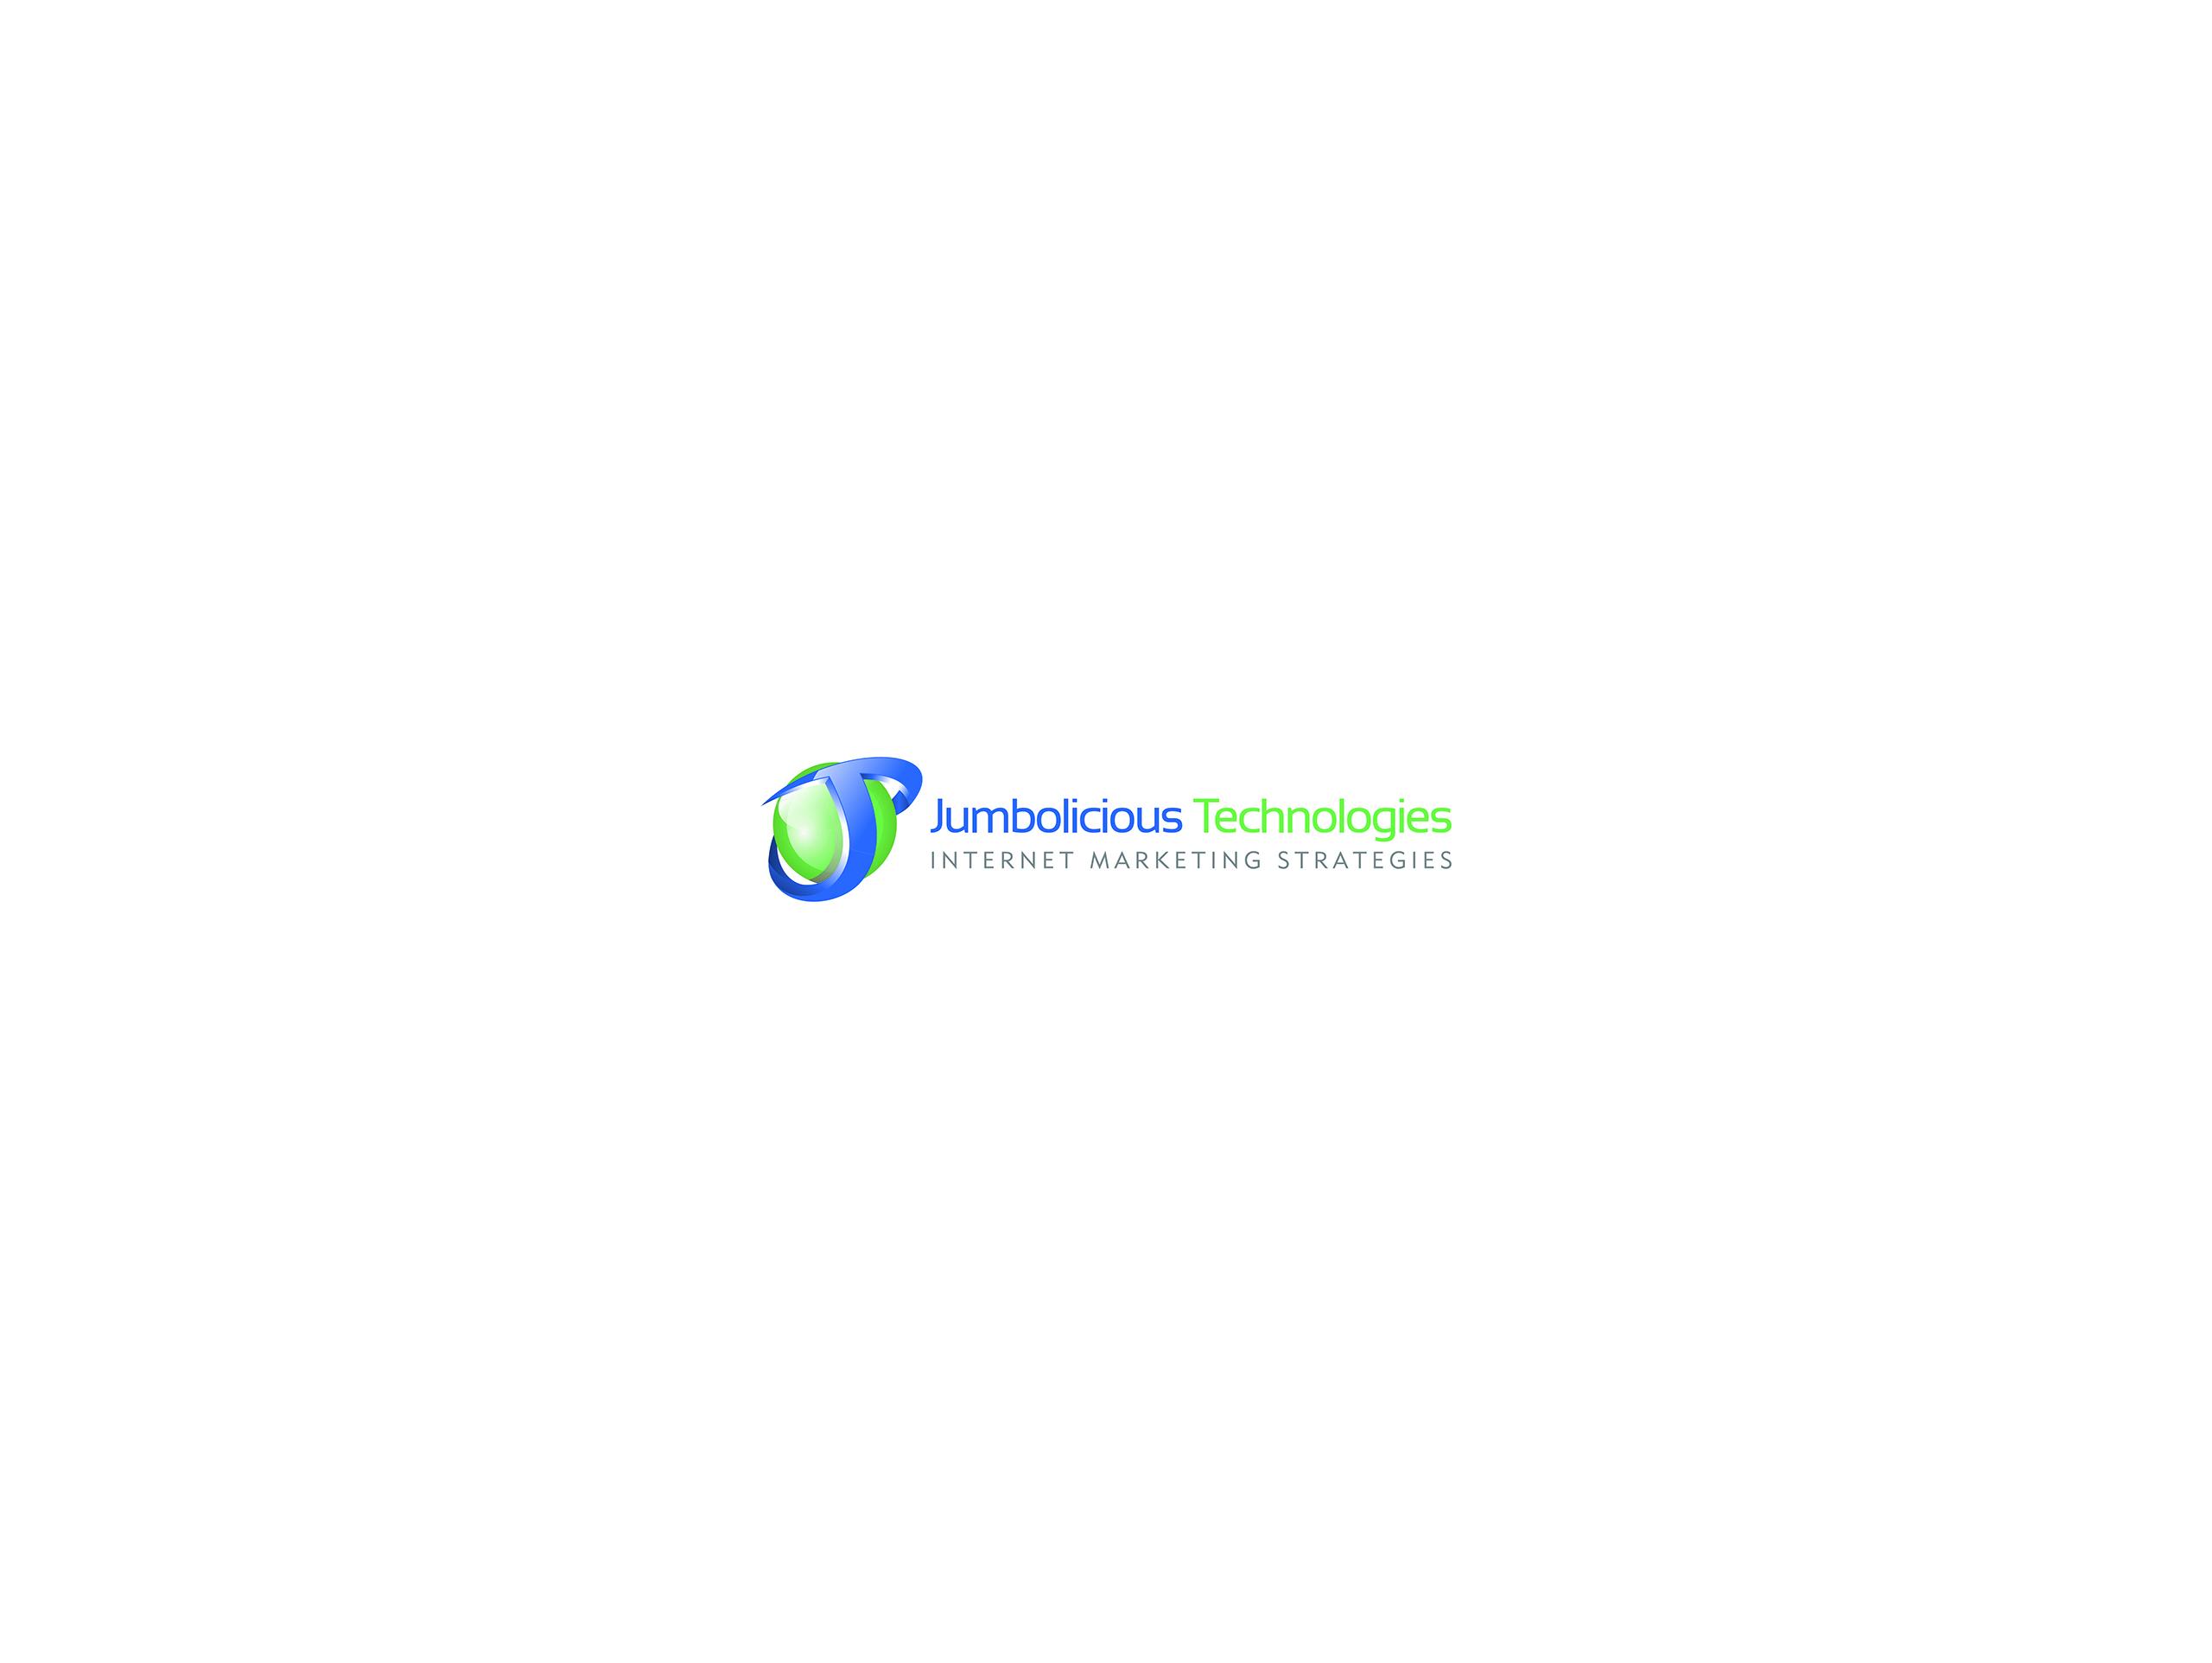 Jumbolicious Technologies